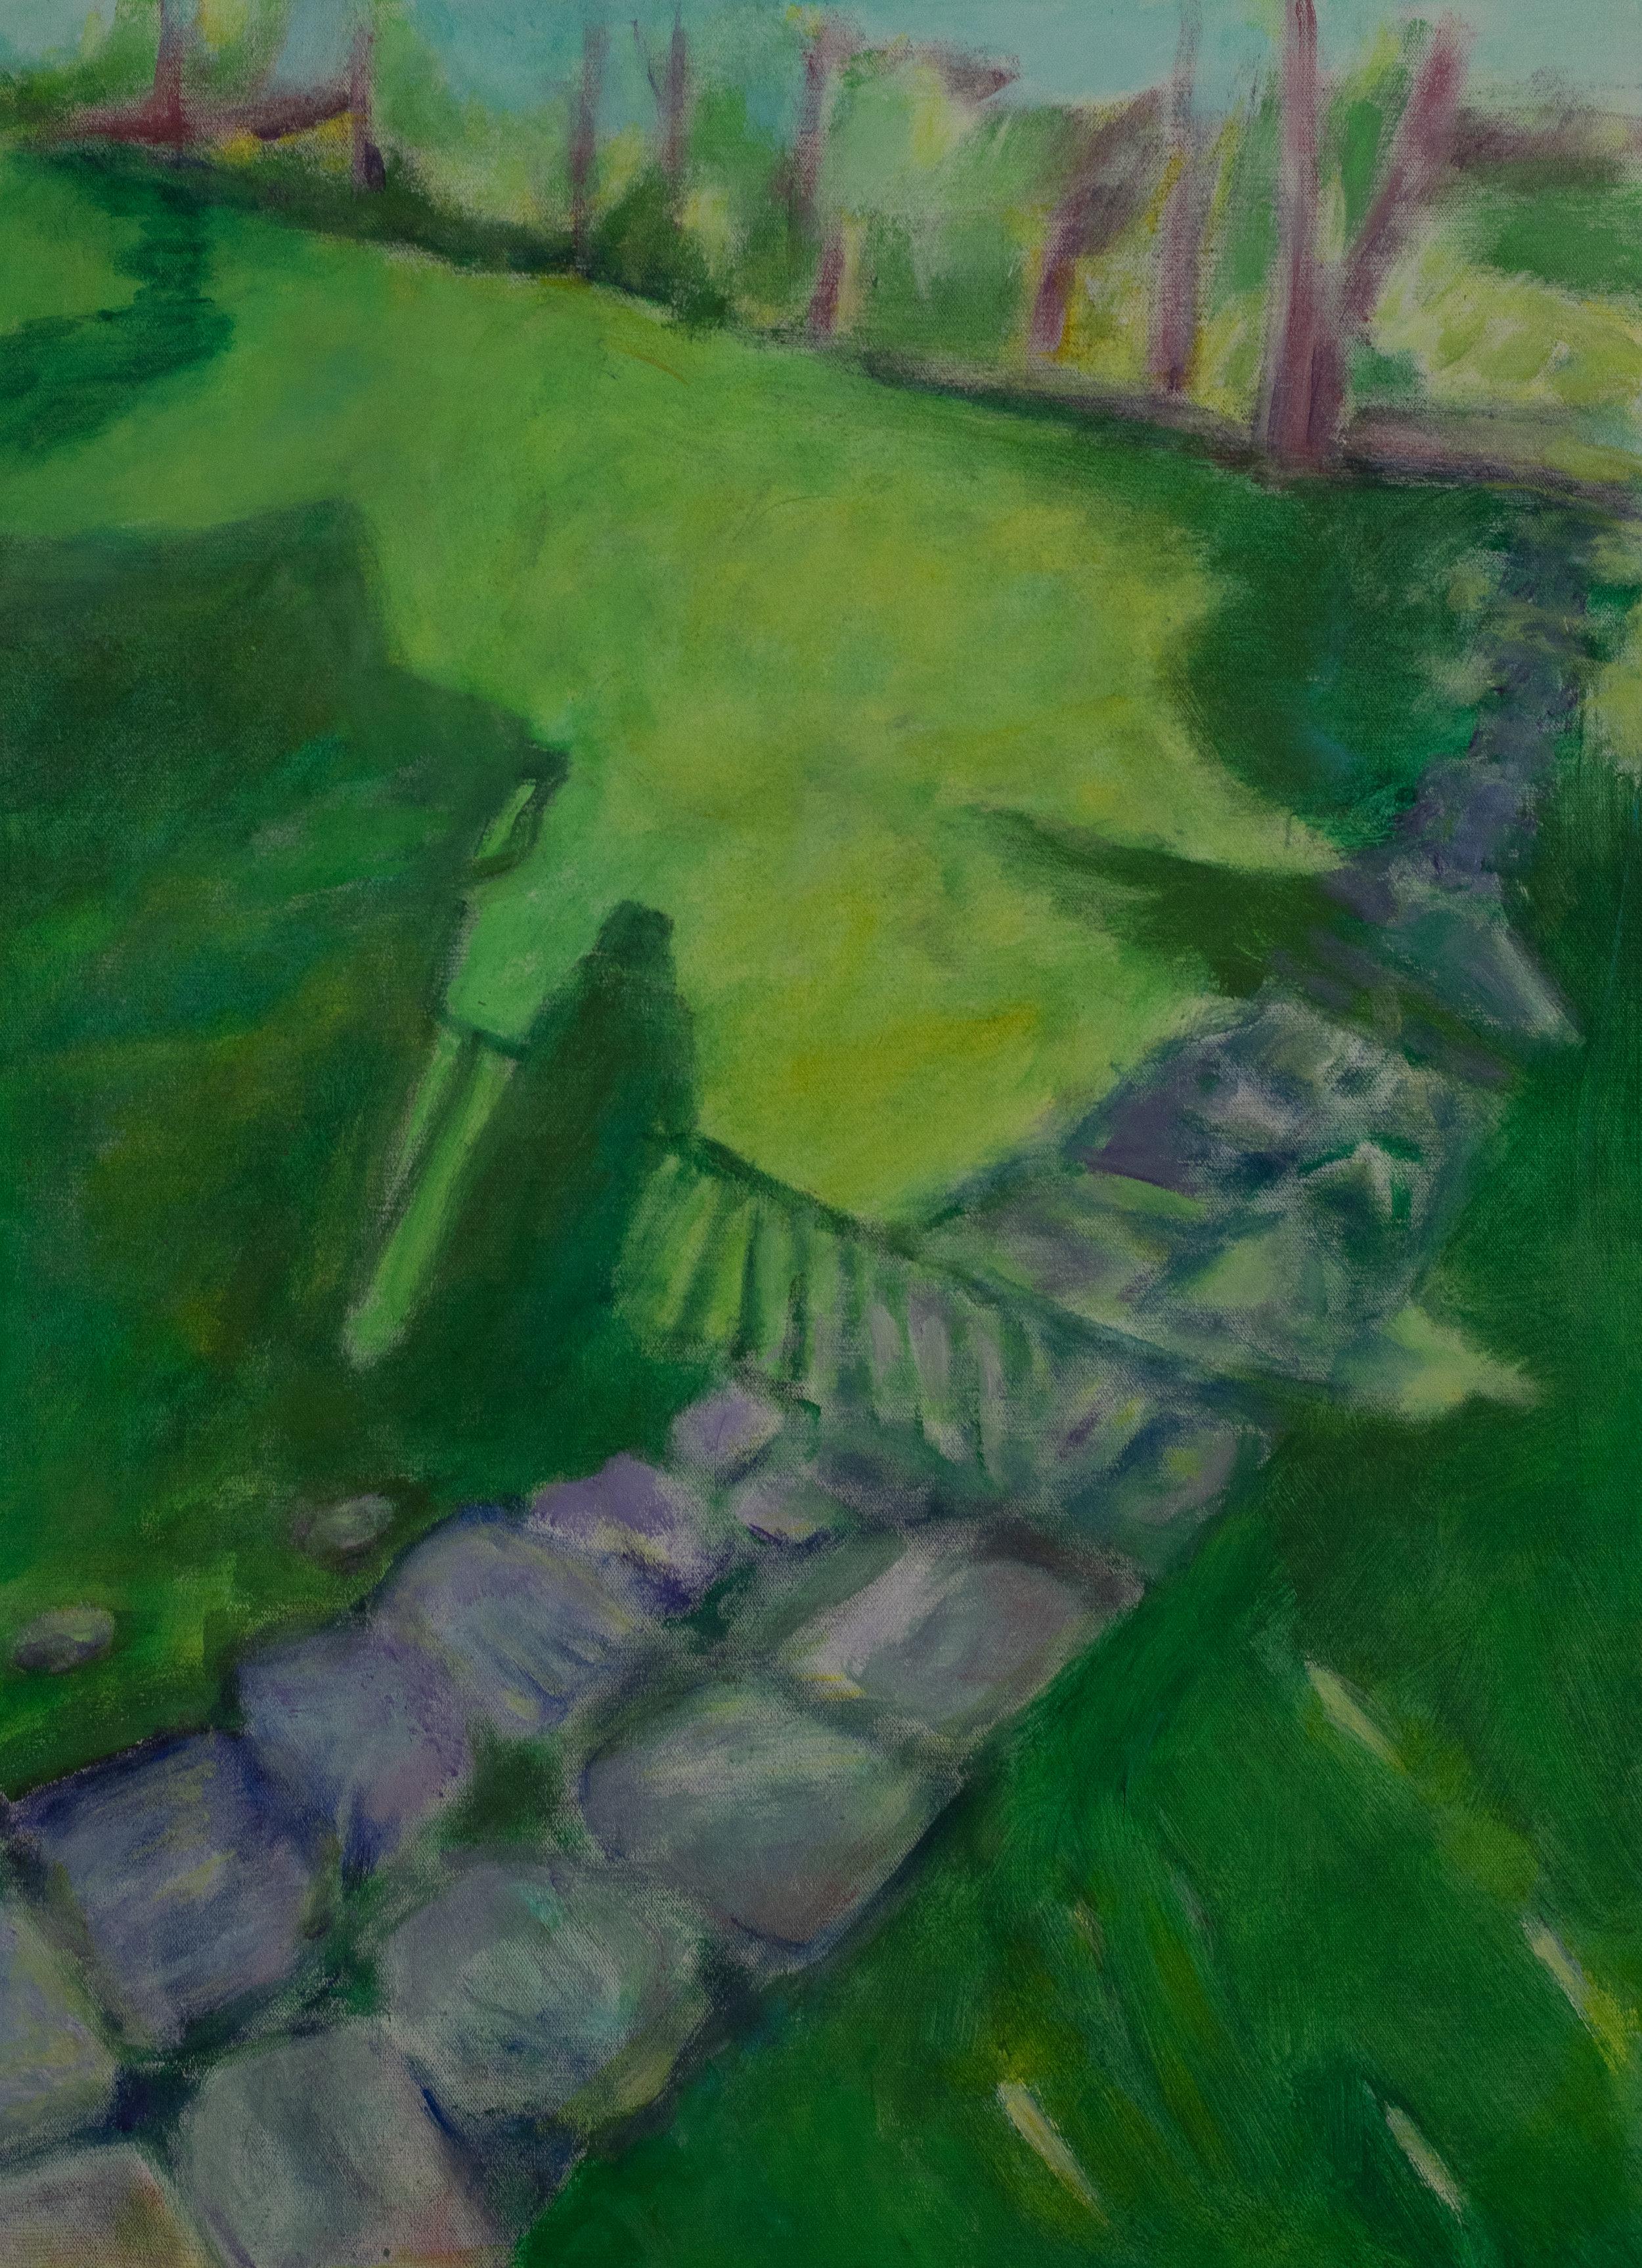 """Contemplation"" 24 x 30 acrylic on canvas, Rachel Lulov Segall"